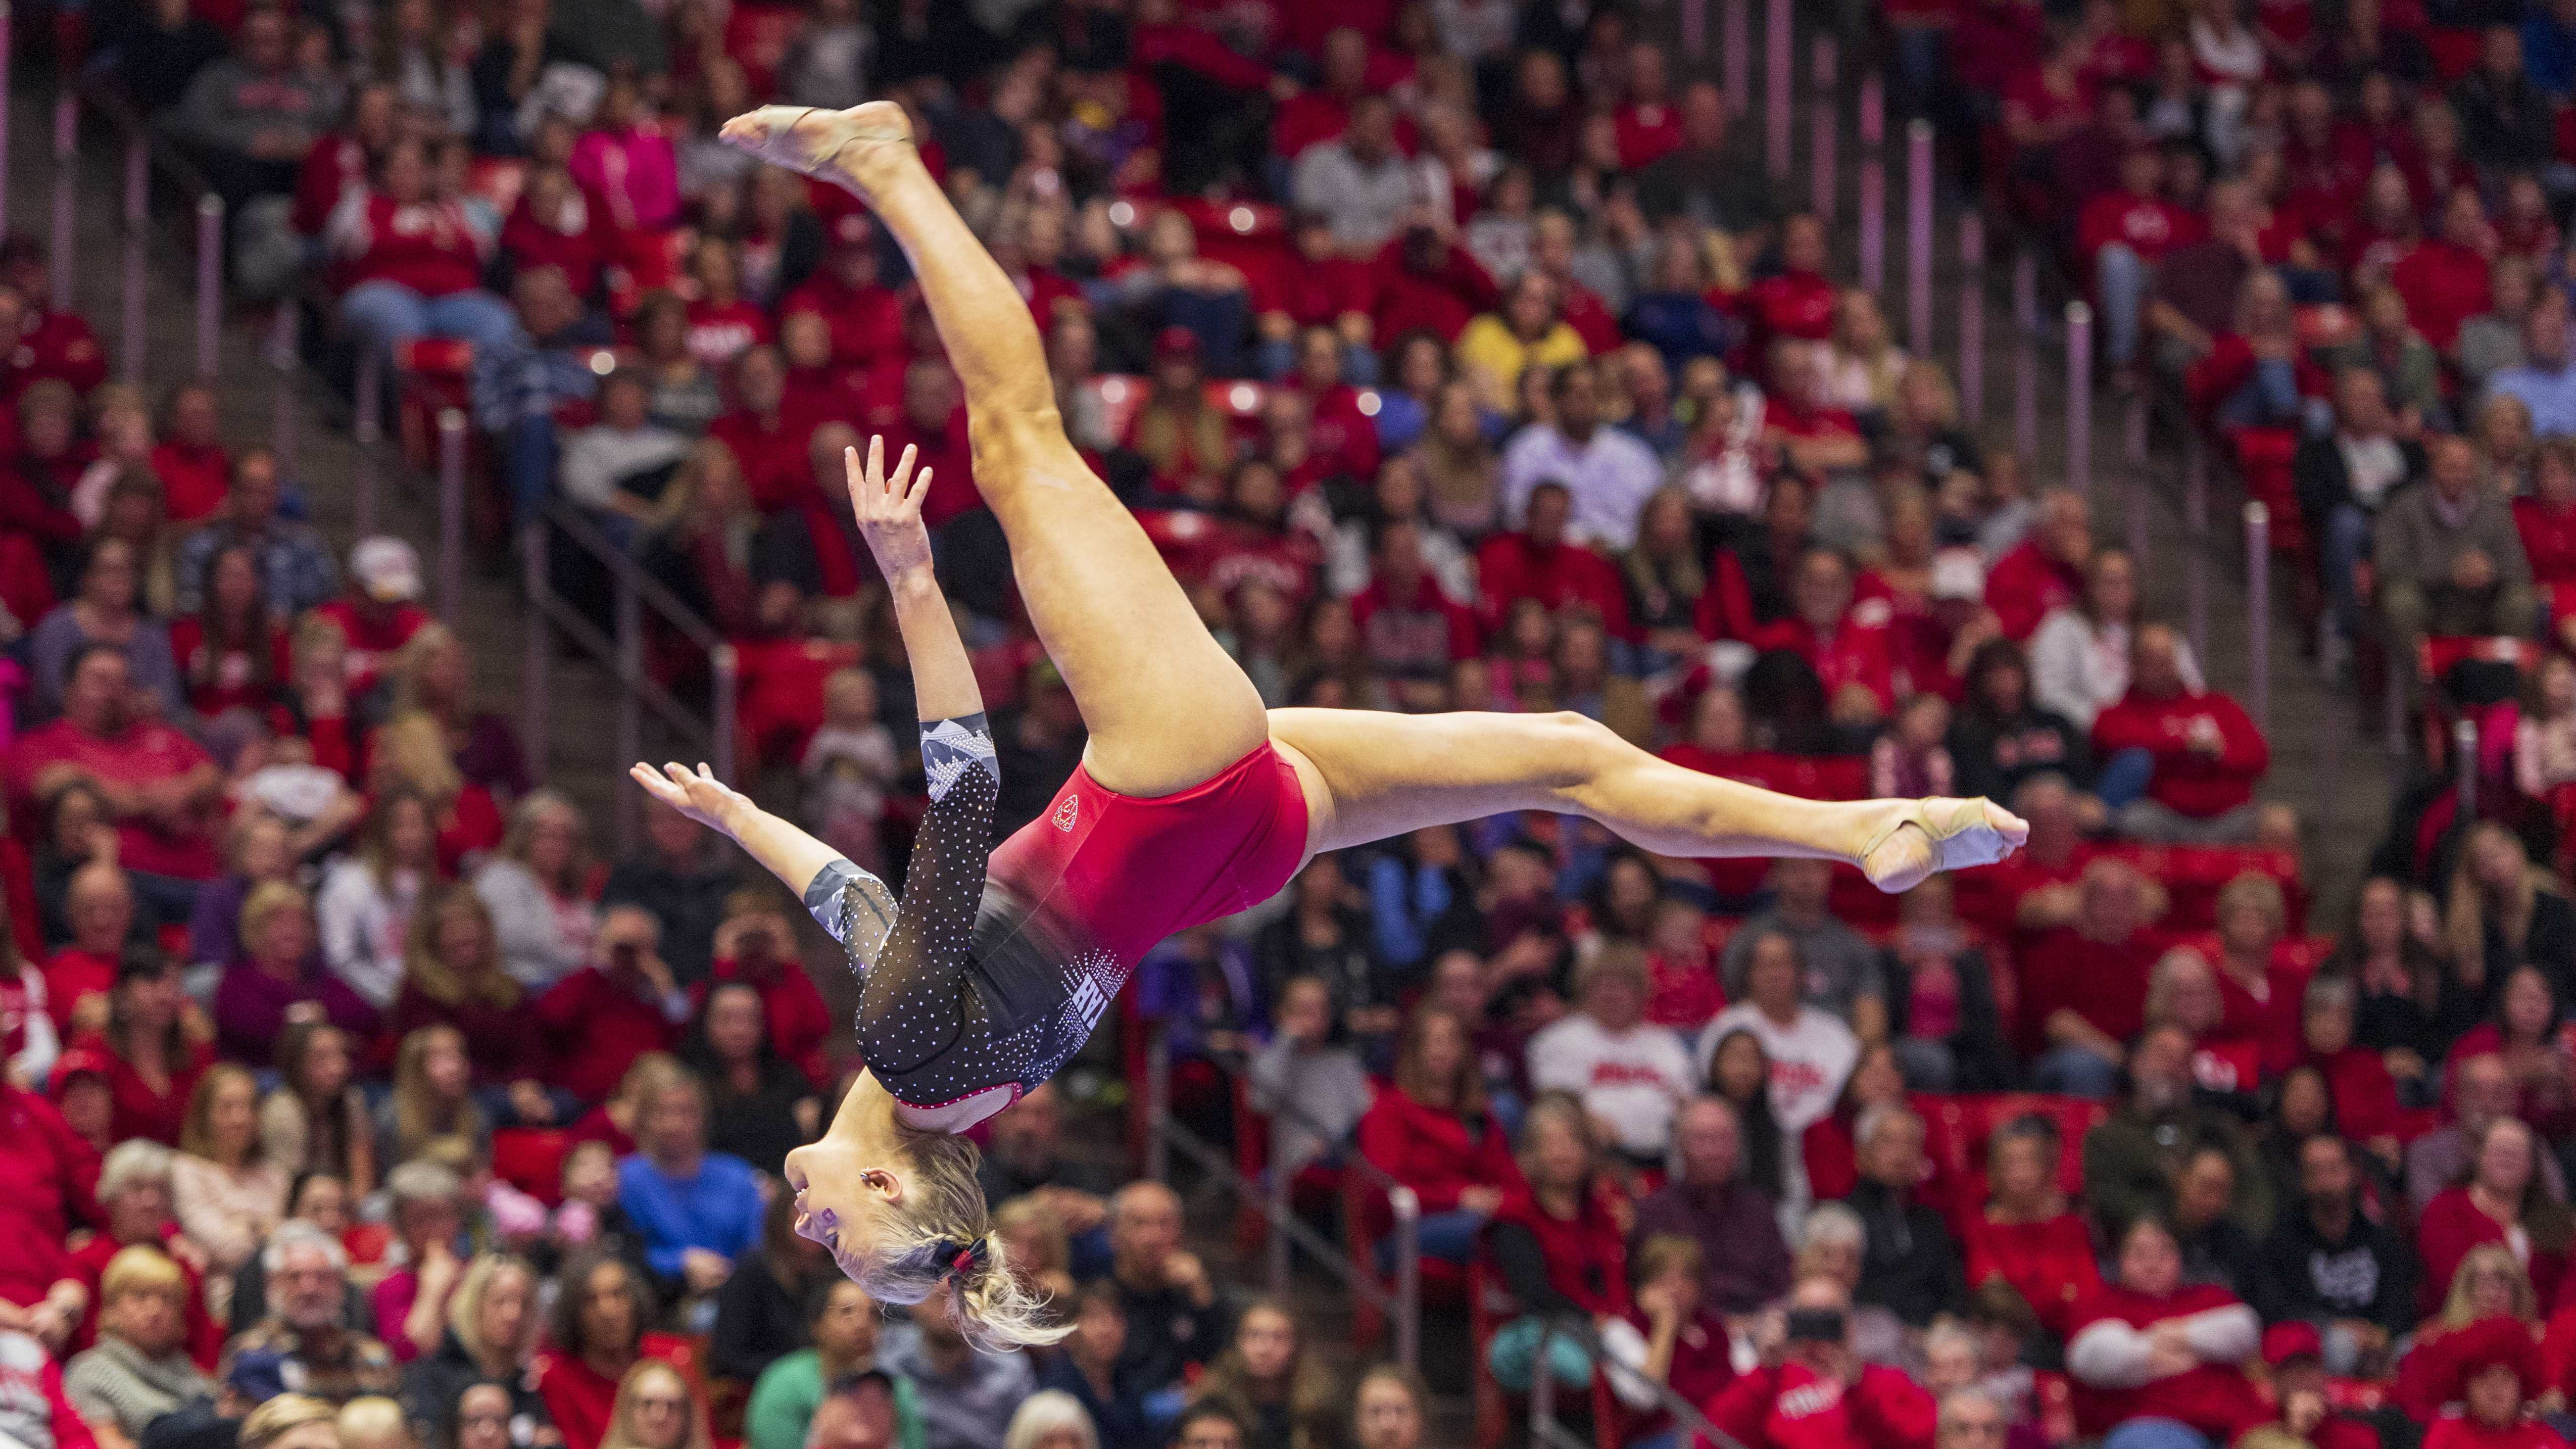 University of Utah women's gymnastics senior MaKenna Merrell-Giles performs on the balance beam in a dual meet vs. Penn State at the Jon M. Huntsman Center in Salt Lake City, Utah on Saturday, Jan. 5, 2019.  (Photo by Kiffer Creveling | The Daily Utah Chronicle)